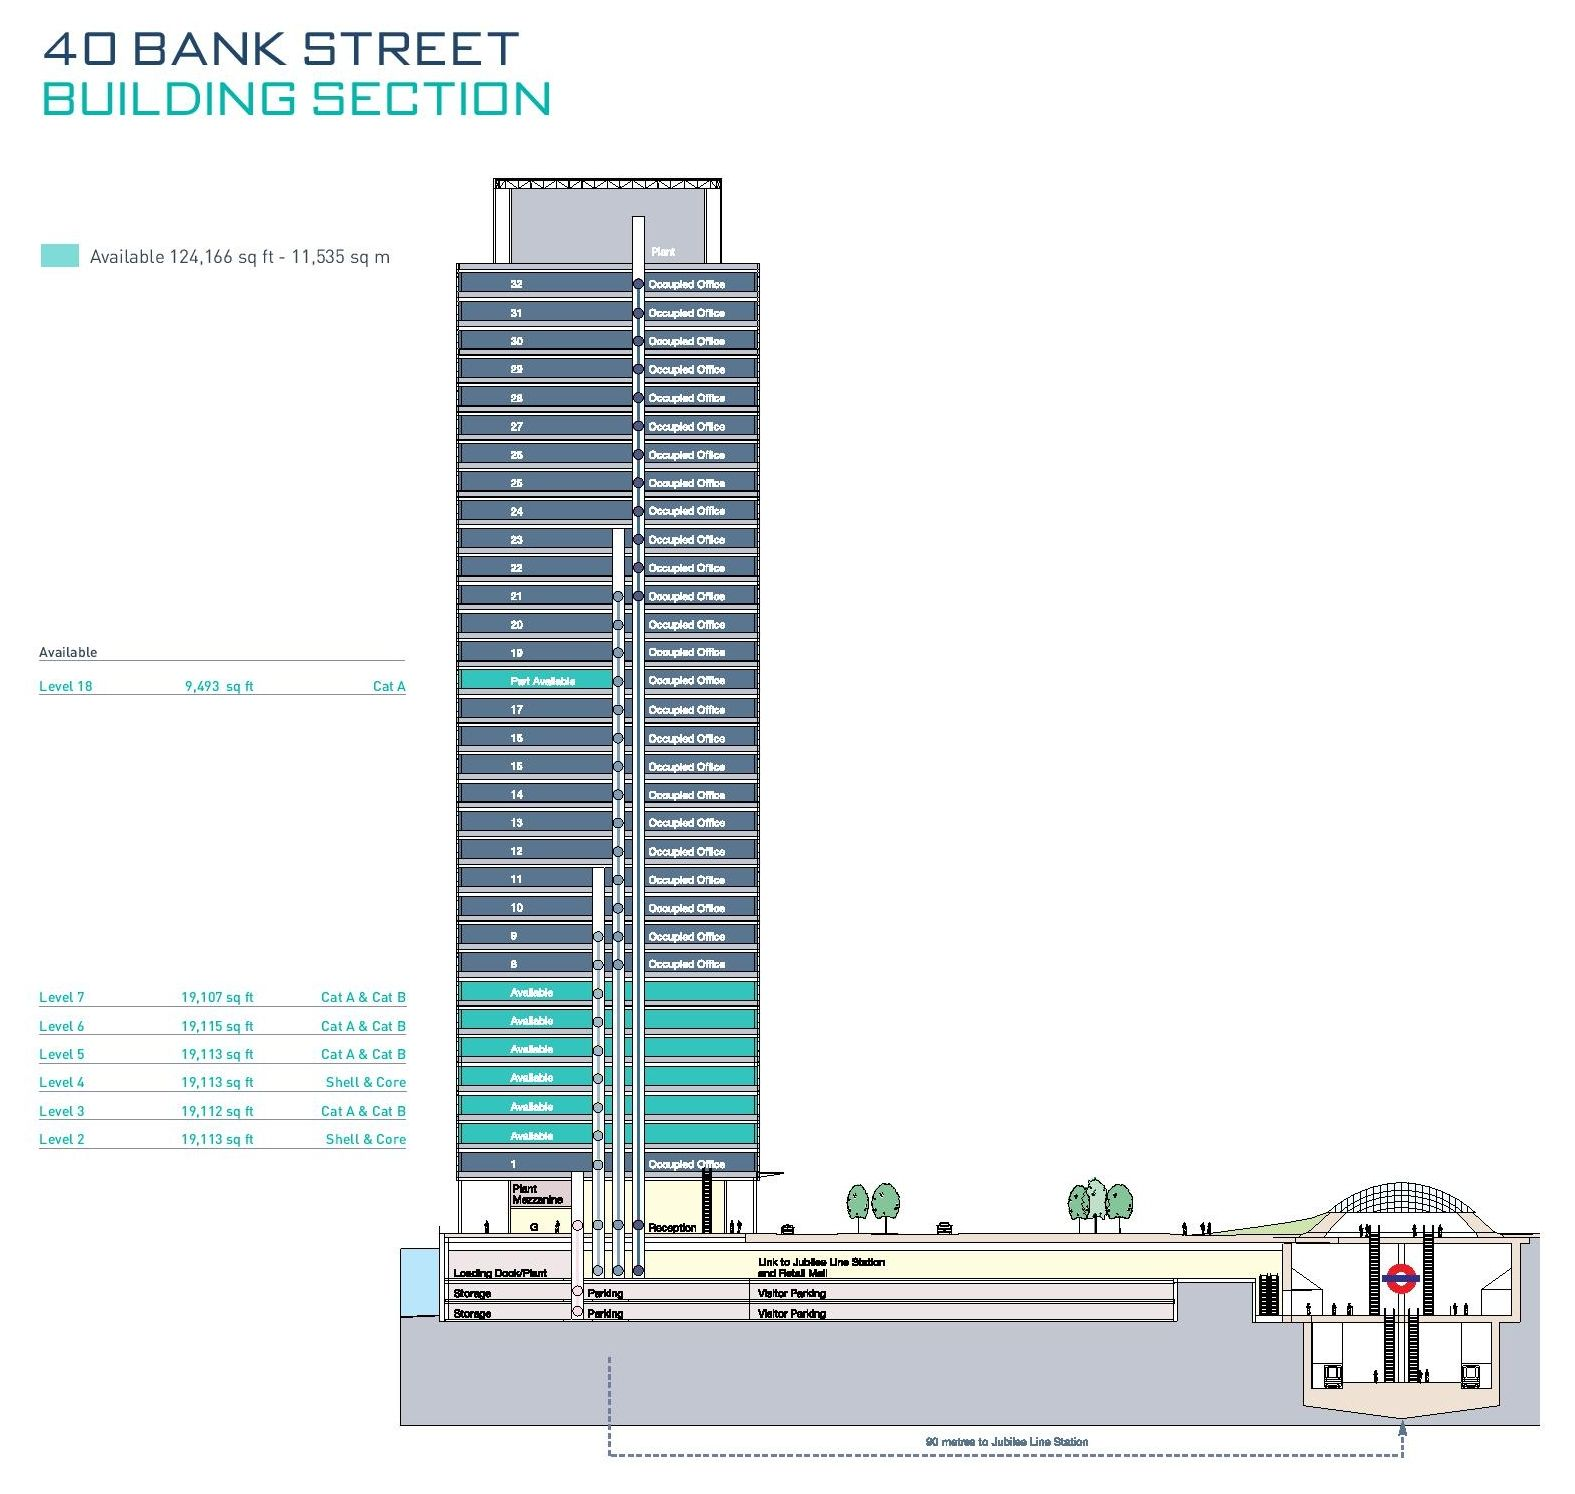 Macy S Herald Square Floor Plan: 40 Bank Street Floor Plans, Canary Wharf, London